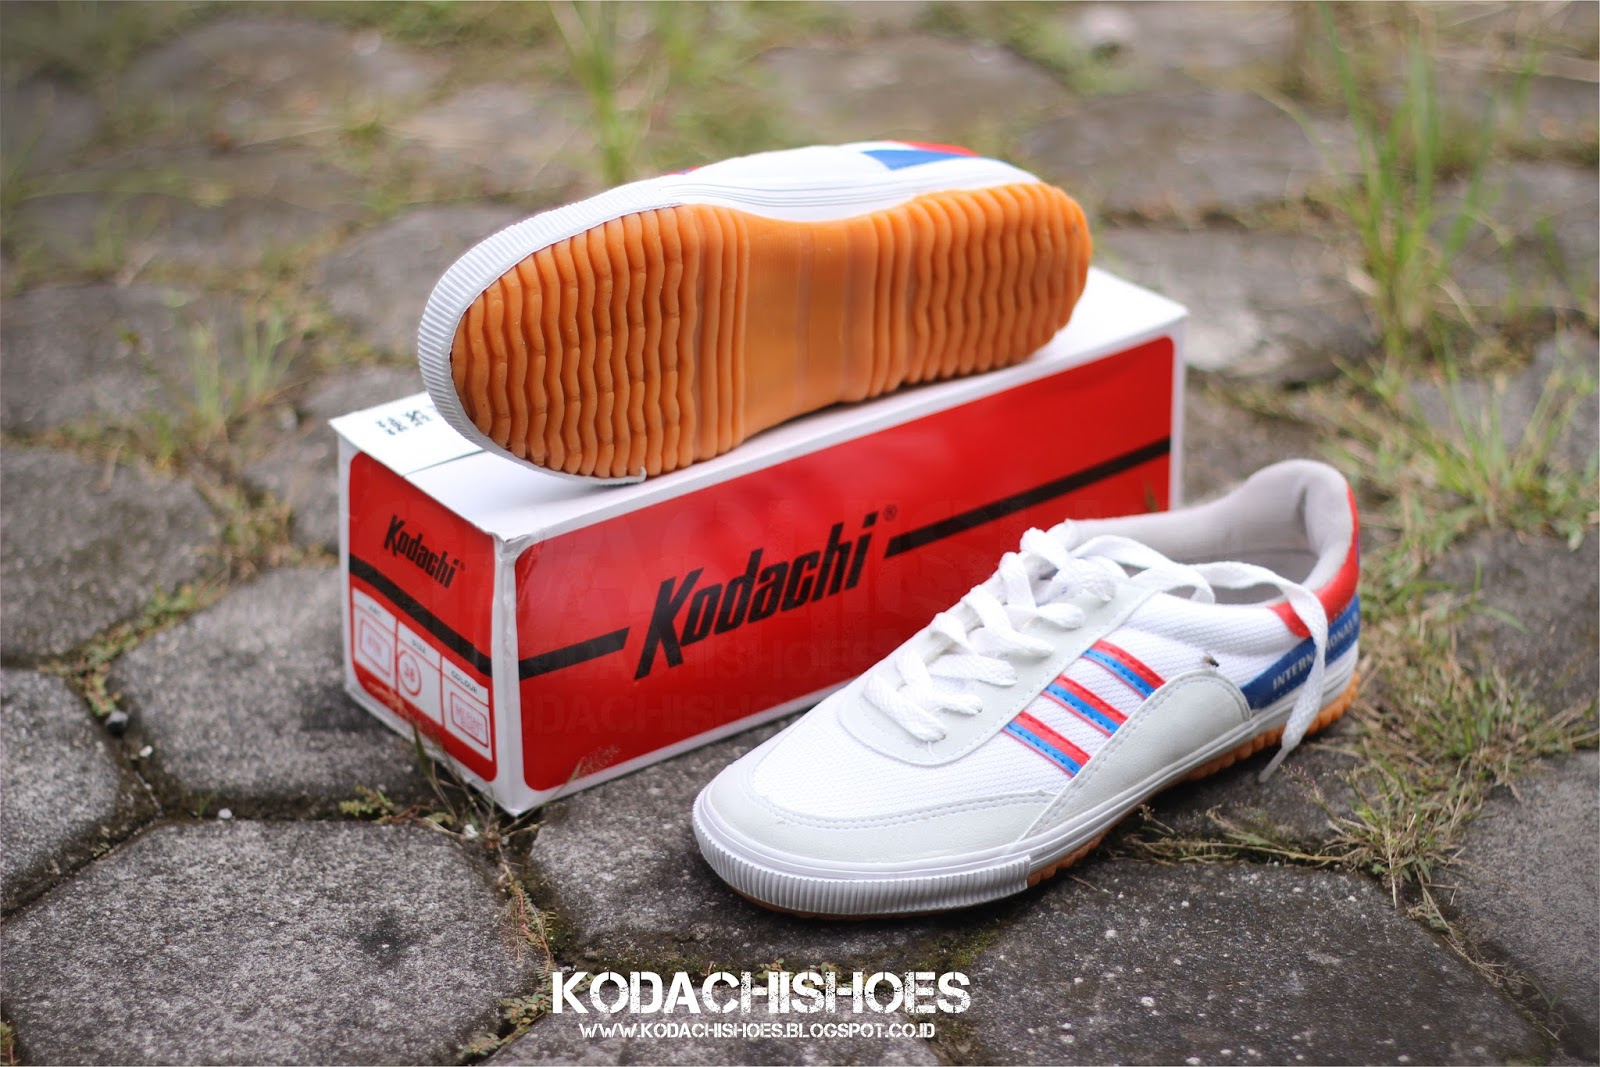 Kodachi 8116 Shoes Sepatu Sport Tersedia Dalam 4 Strip Yang Agresif Merah Silver Biru Dan Kuning